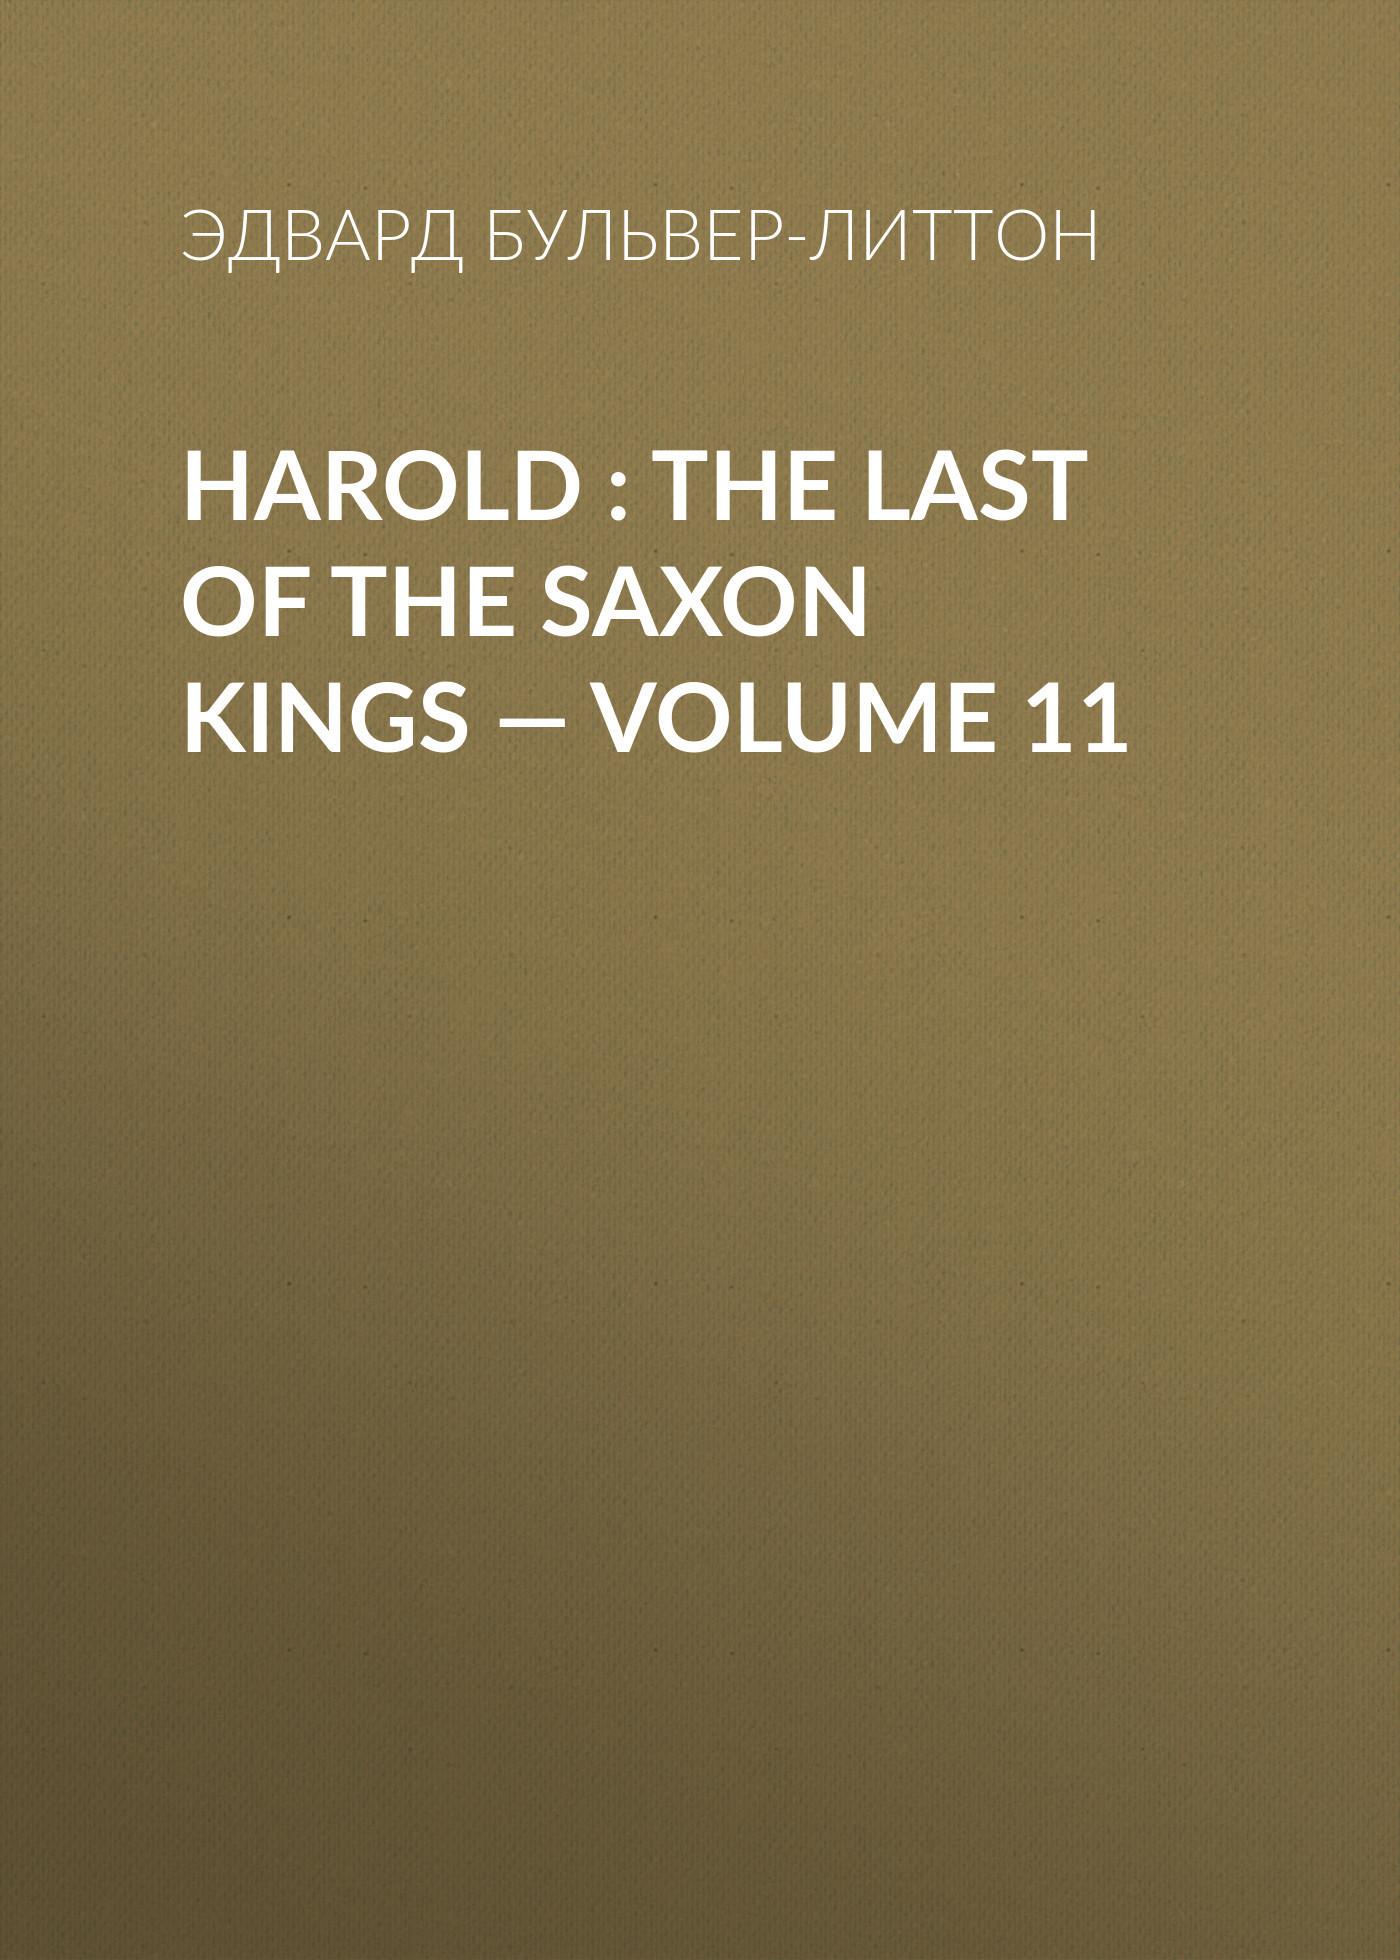 Эдвард Бульвер-Литтон Harold : the Last of the Saxon Kings — Volume 11 fielding harold amelia volume 1